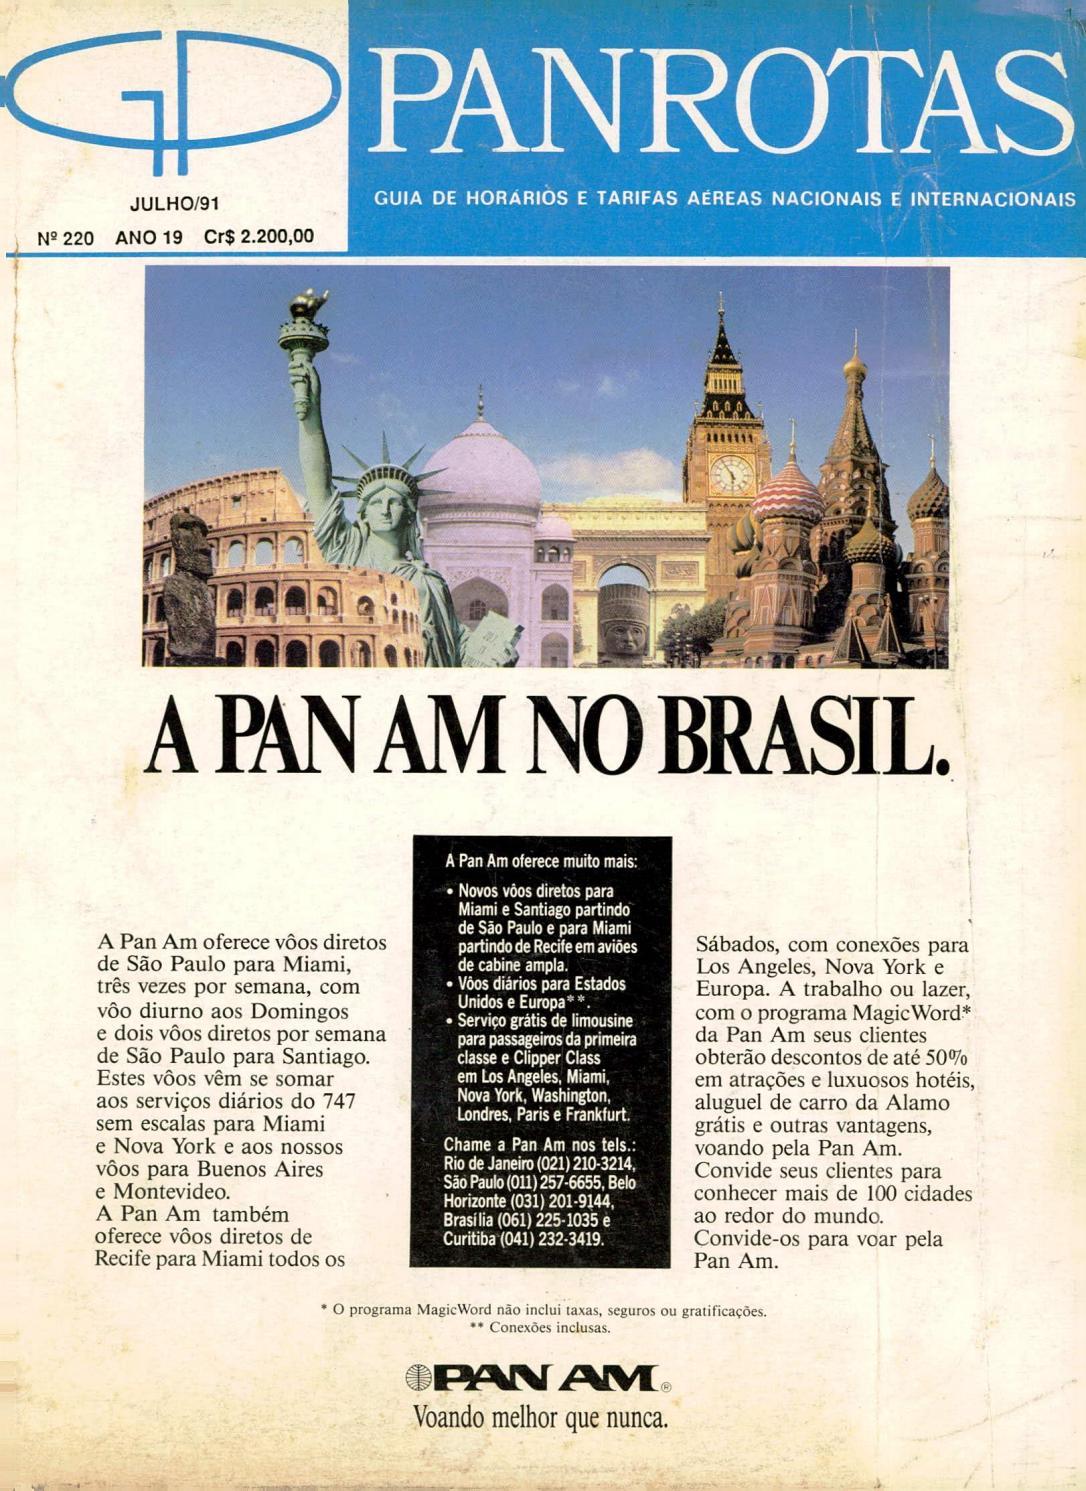 fec89bc2a Guia PANROTAS - Edição 220 - Julho/1991 by PANROTAS Editora - issuu